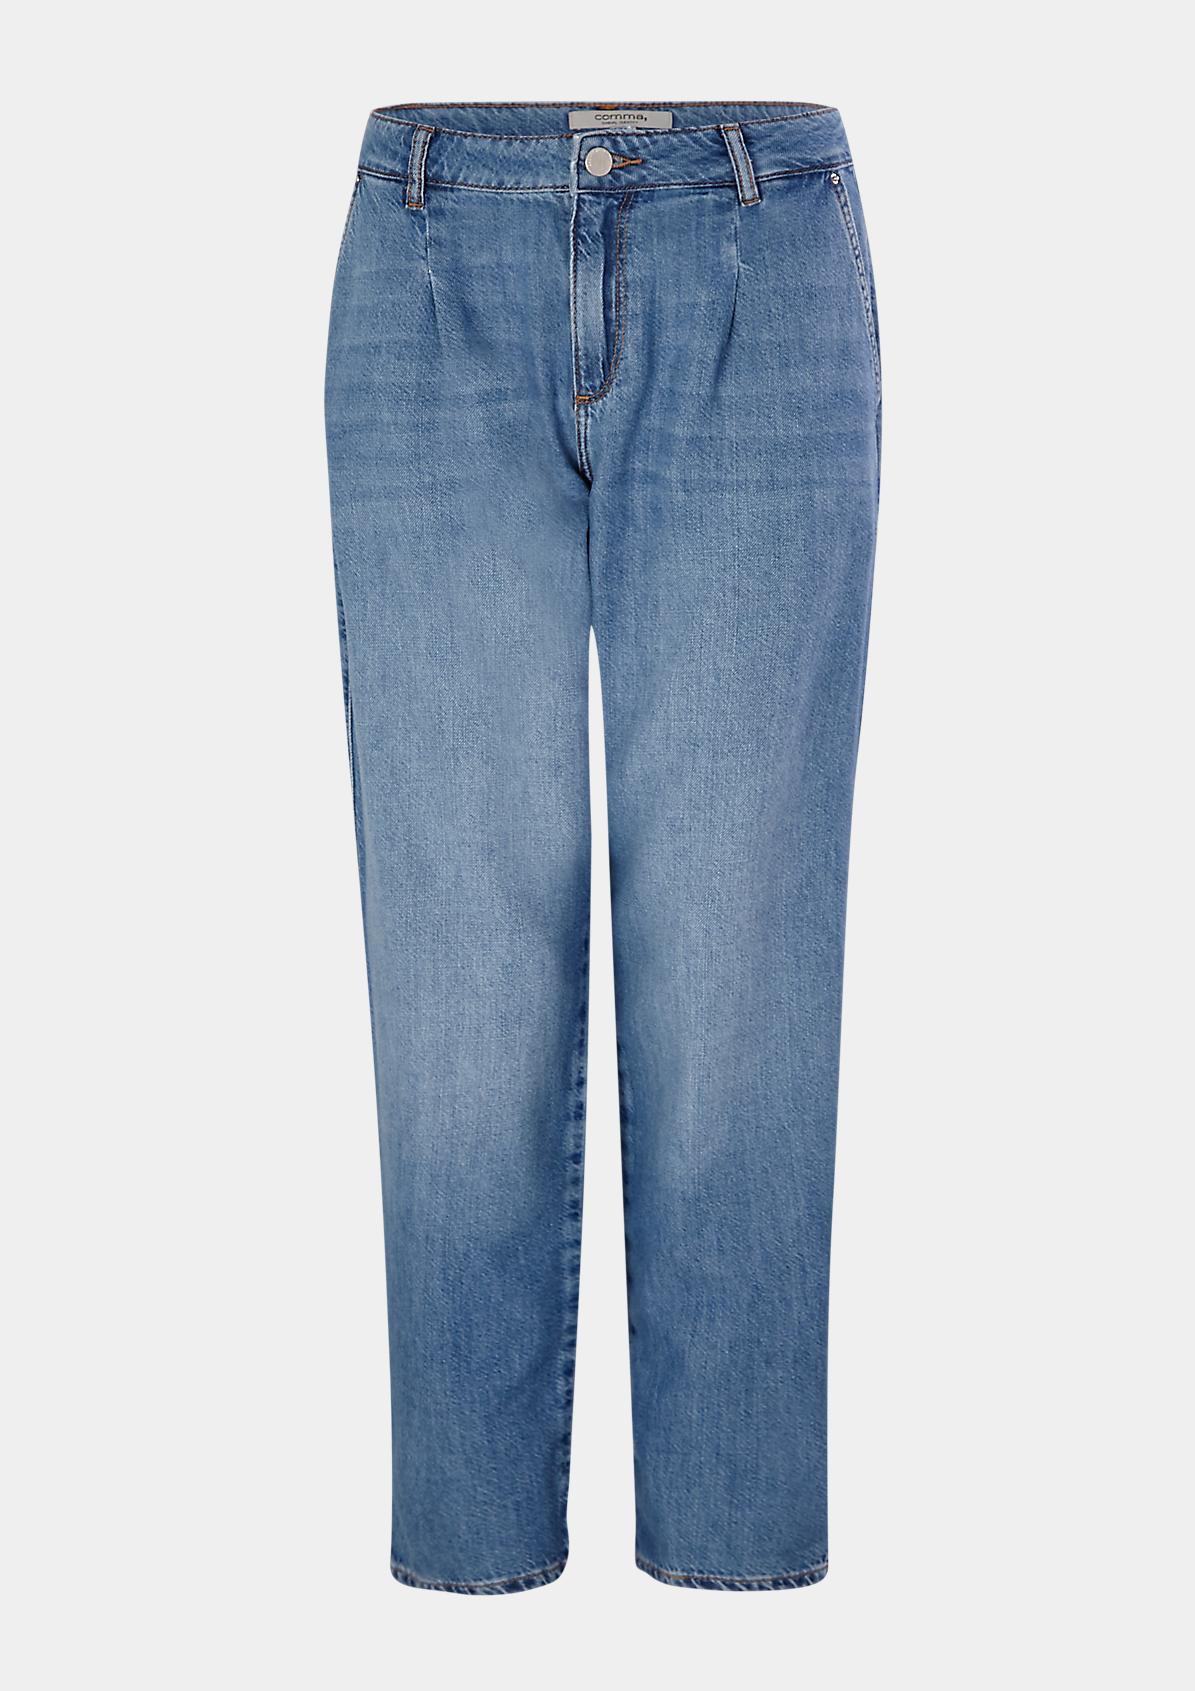 Jeans aus leichtem Lyocell-Denim